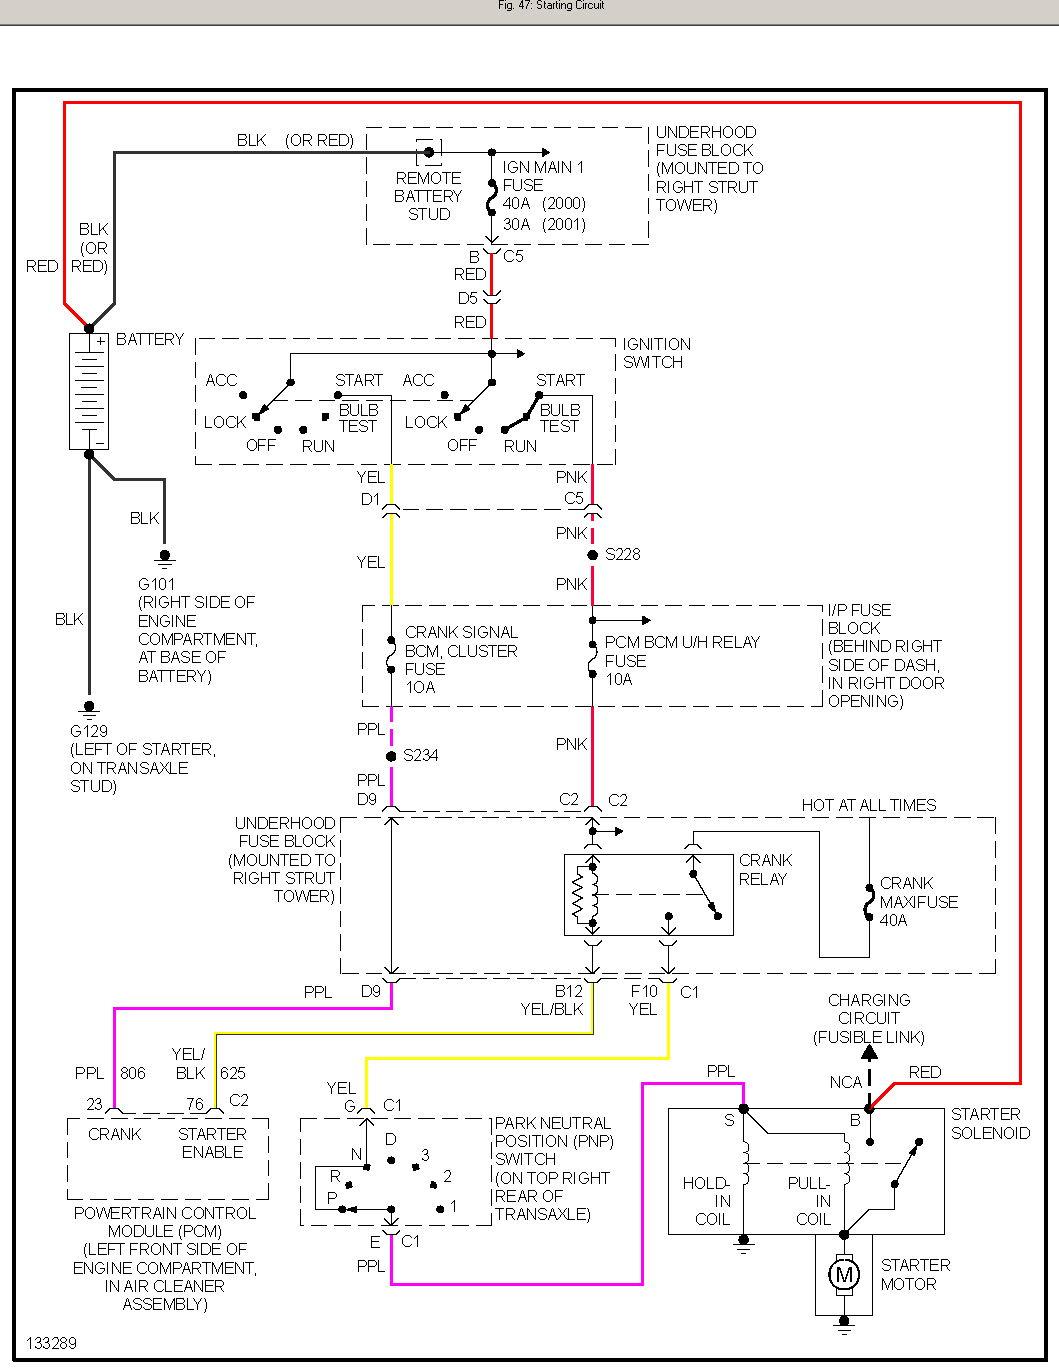 80 starting_circuit_buick_regal_fceca9d2b730e47ef5d9661ca18f594b4c9a1977 wiring diagram 2002 buick century vats system 2003 buick century 2002 buick century wiring diagram at cos-gaming.co